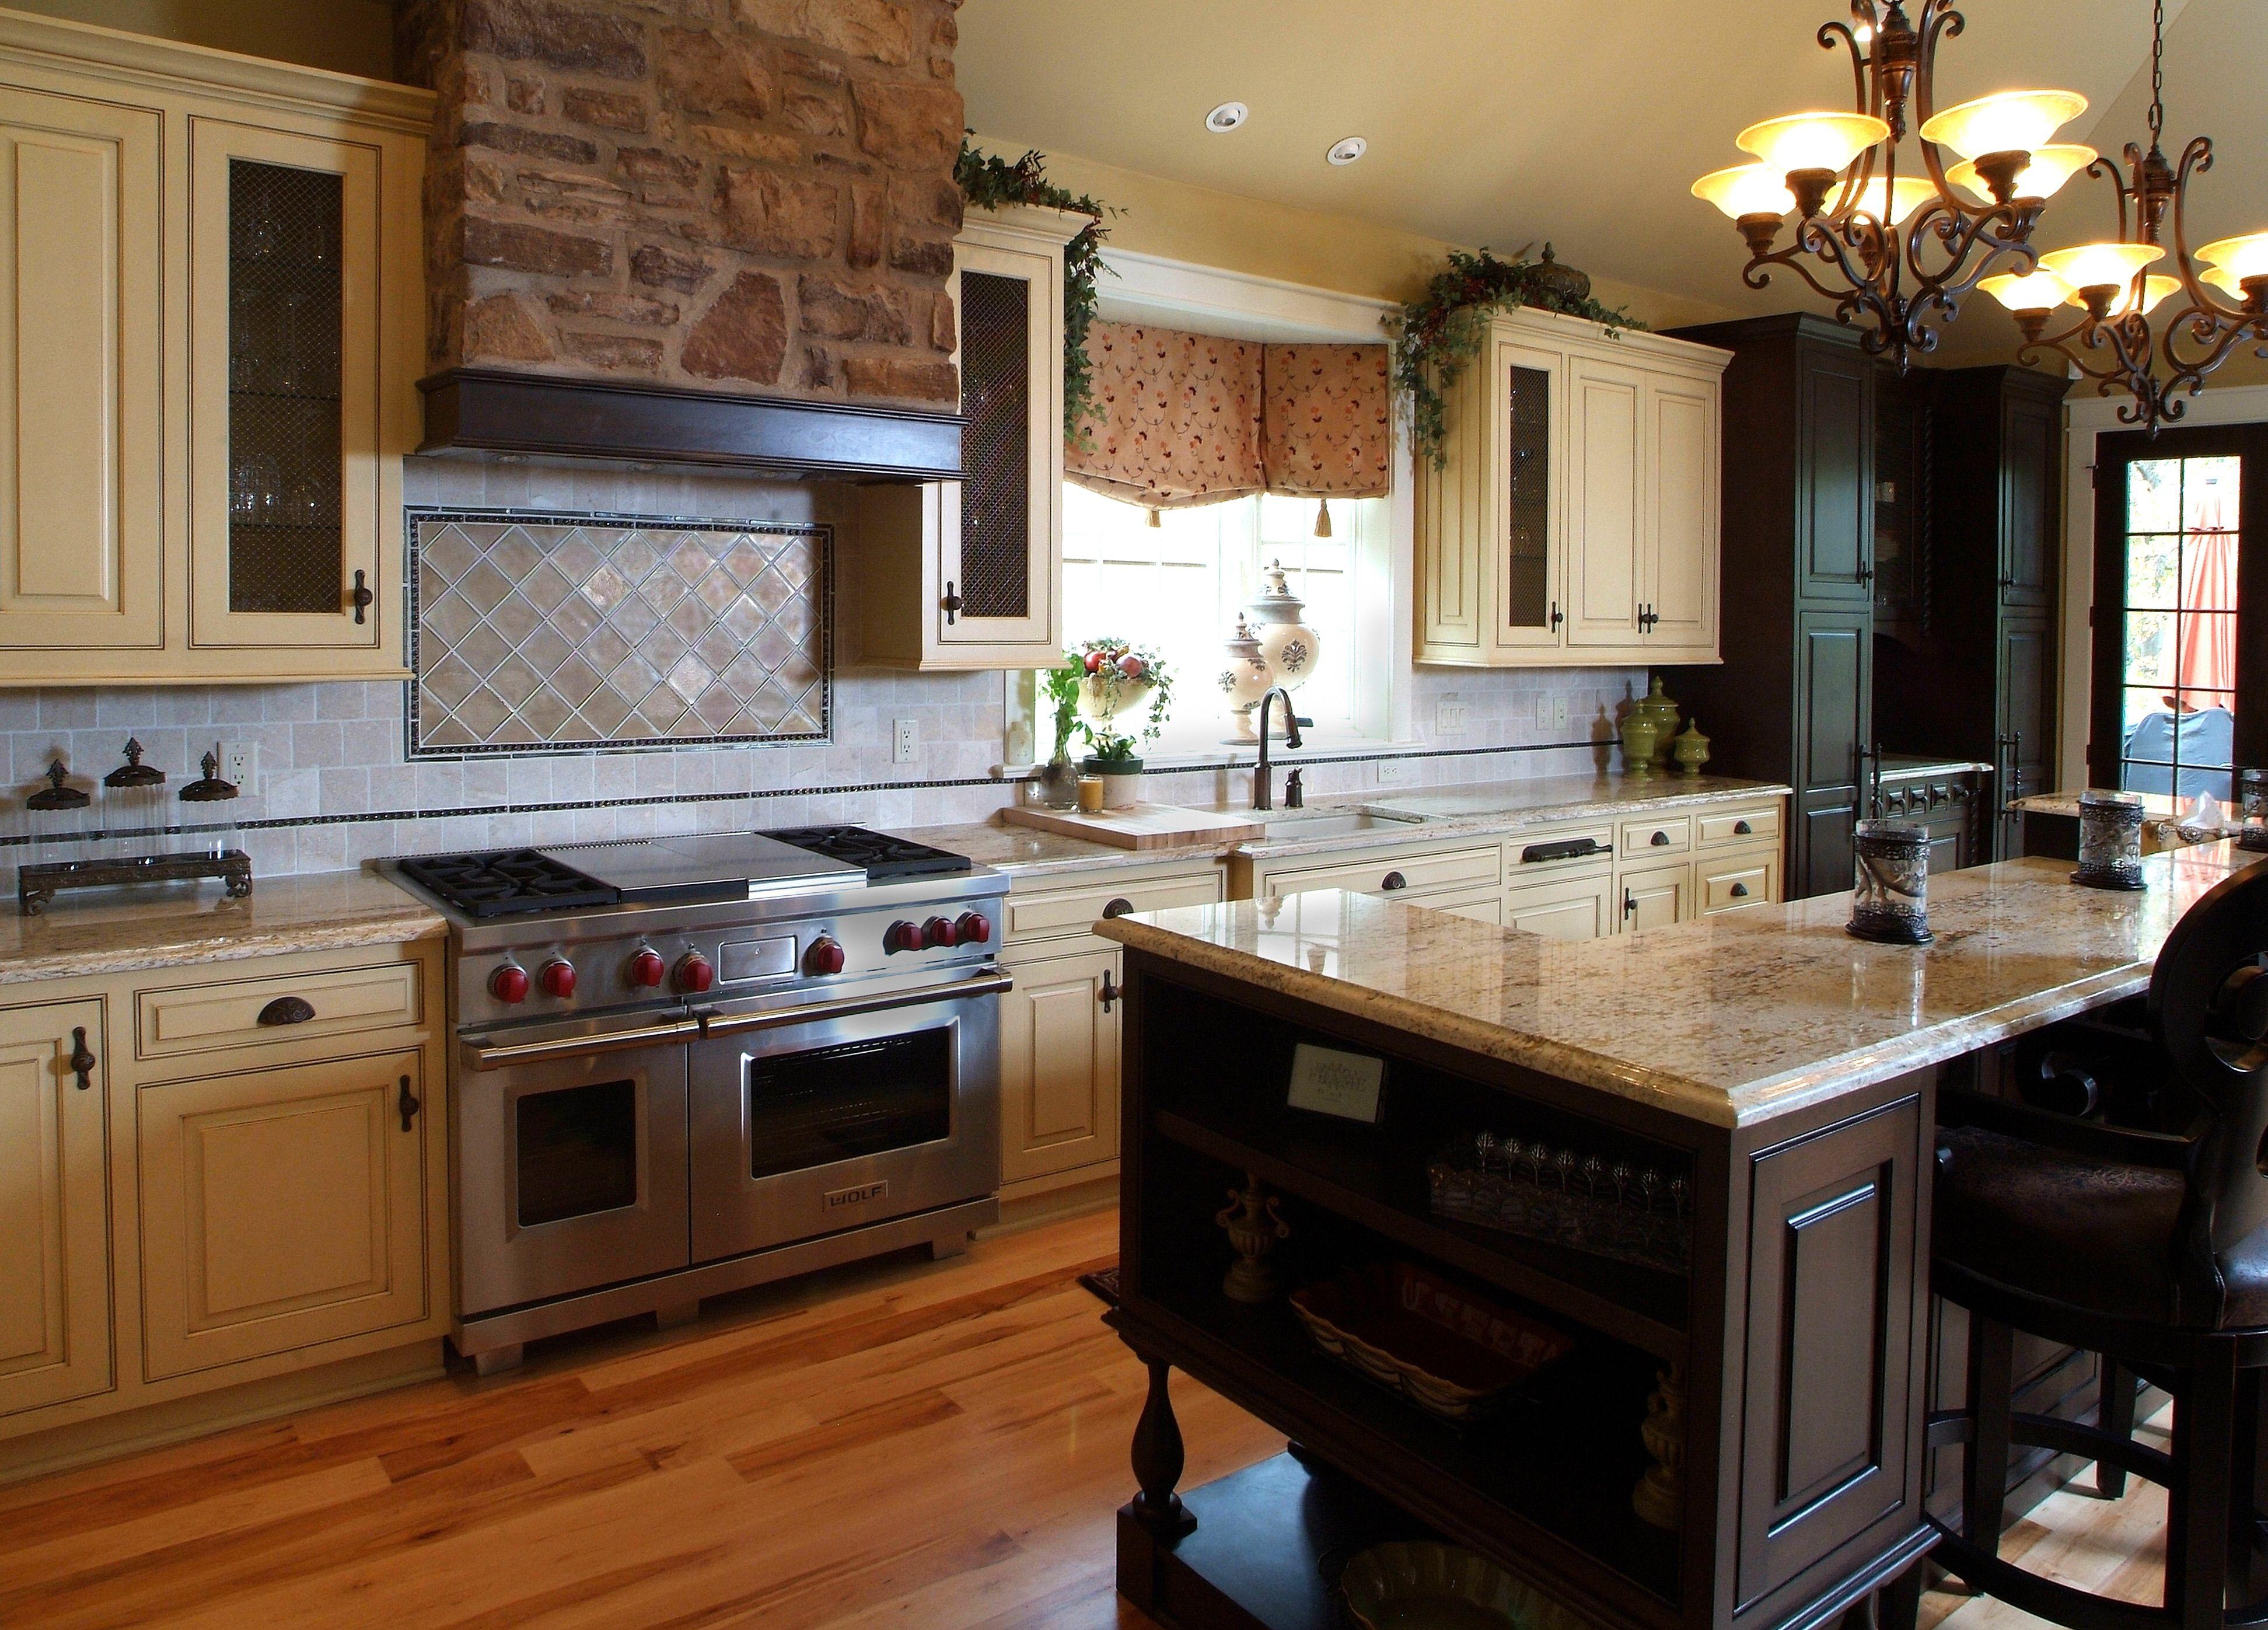 Fake stone rangehood chimney + dark island/cream cabinets ...